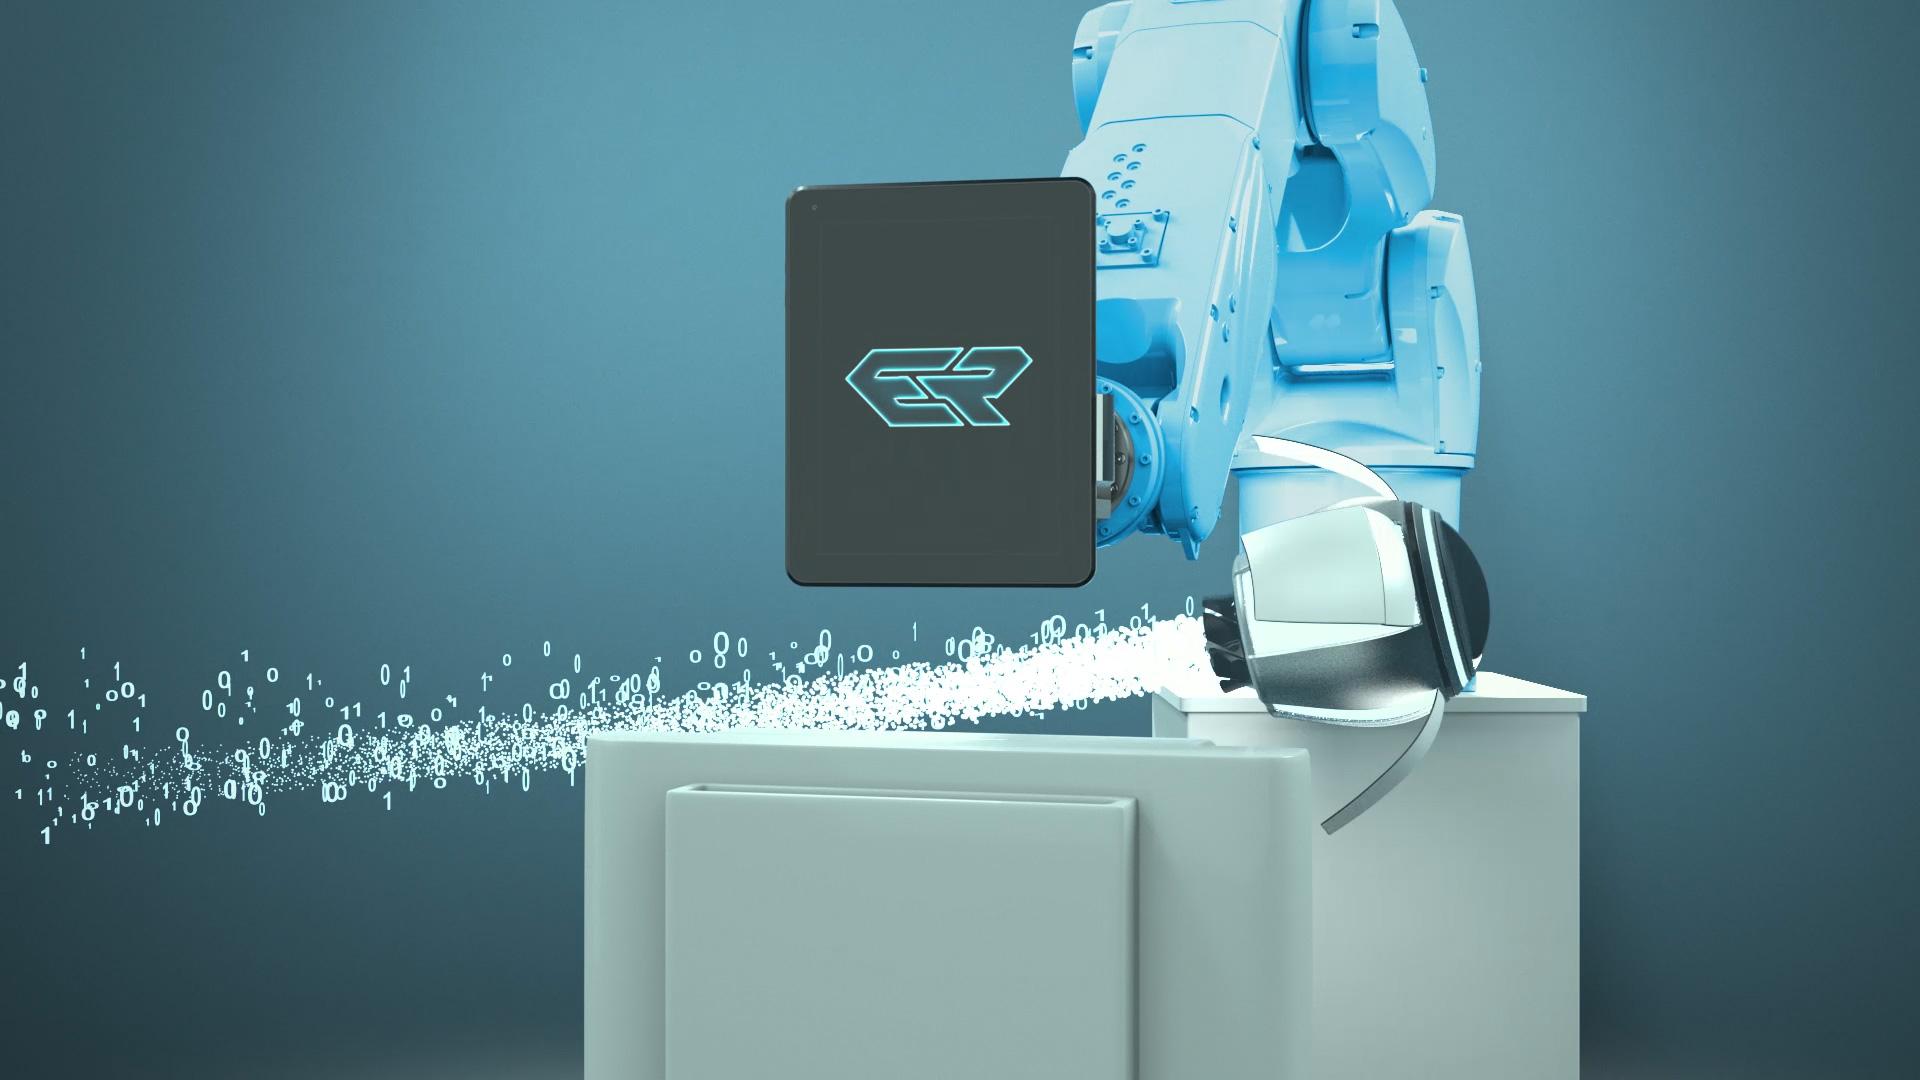 EASYROBOTS: Simplifies Robots World